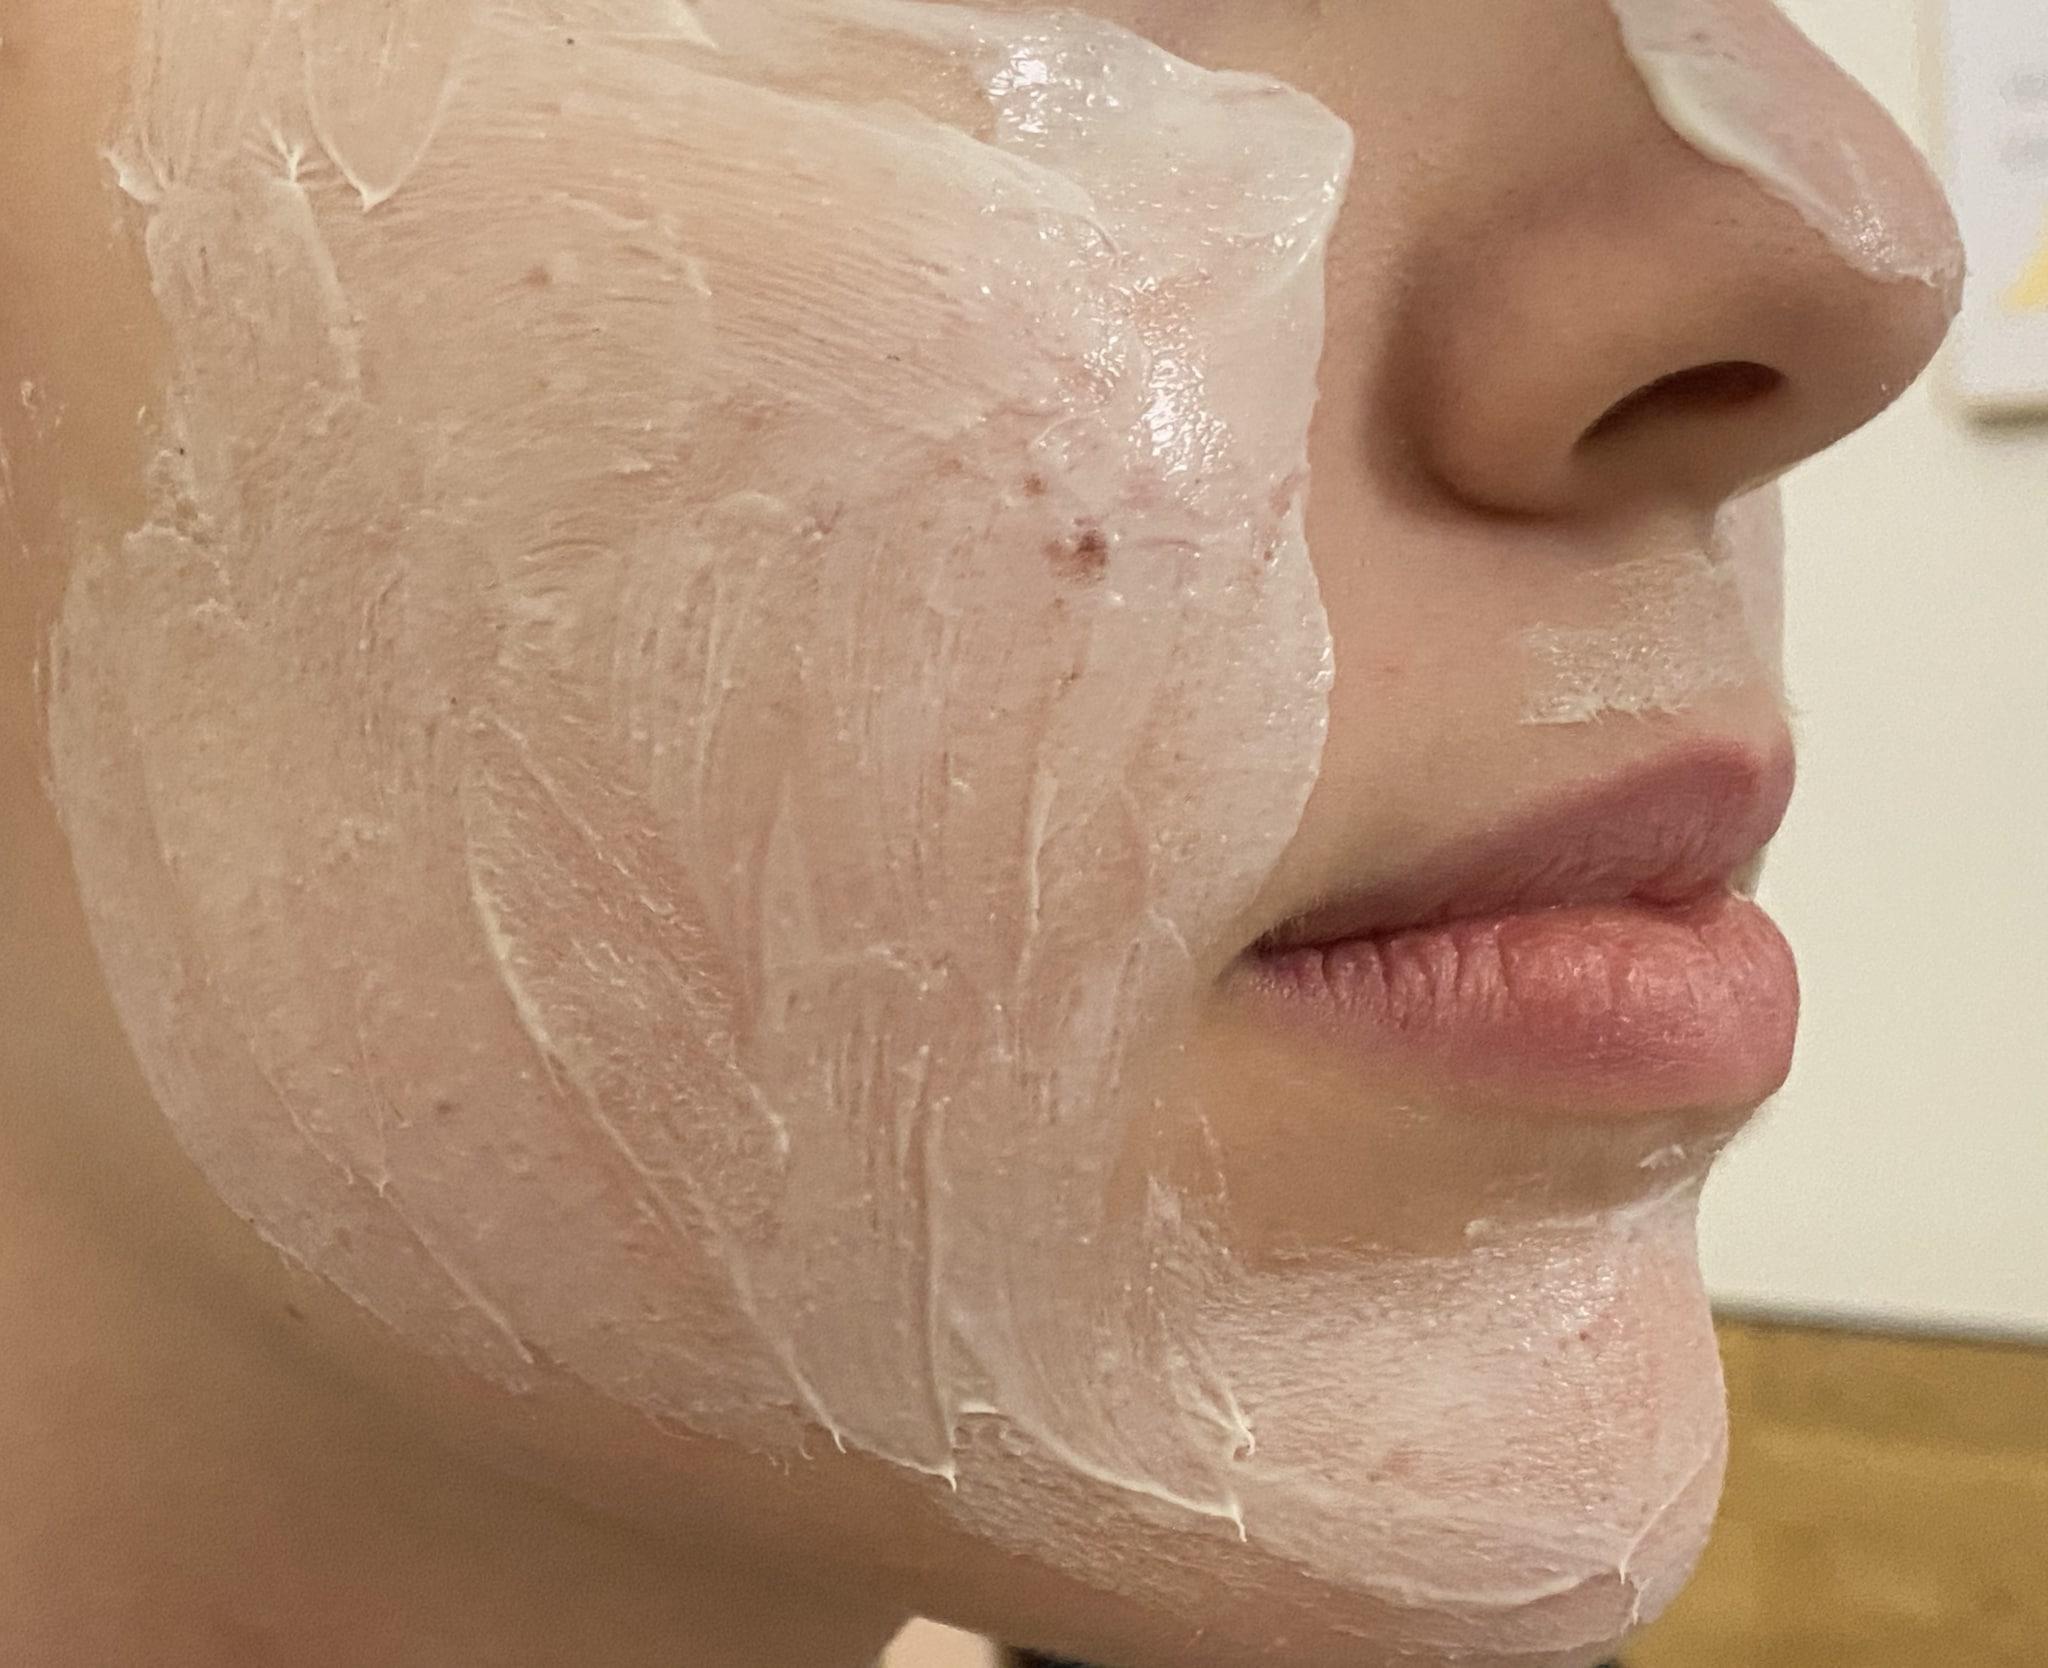 maschera-viso-come-applicarla